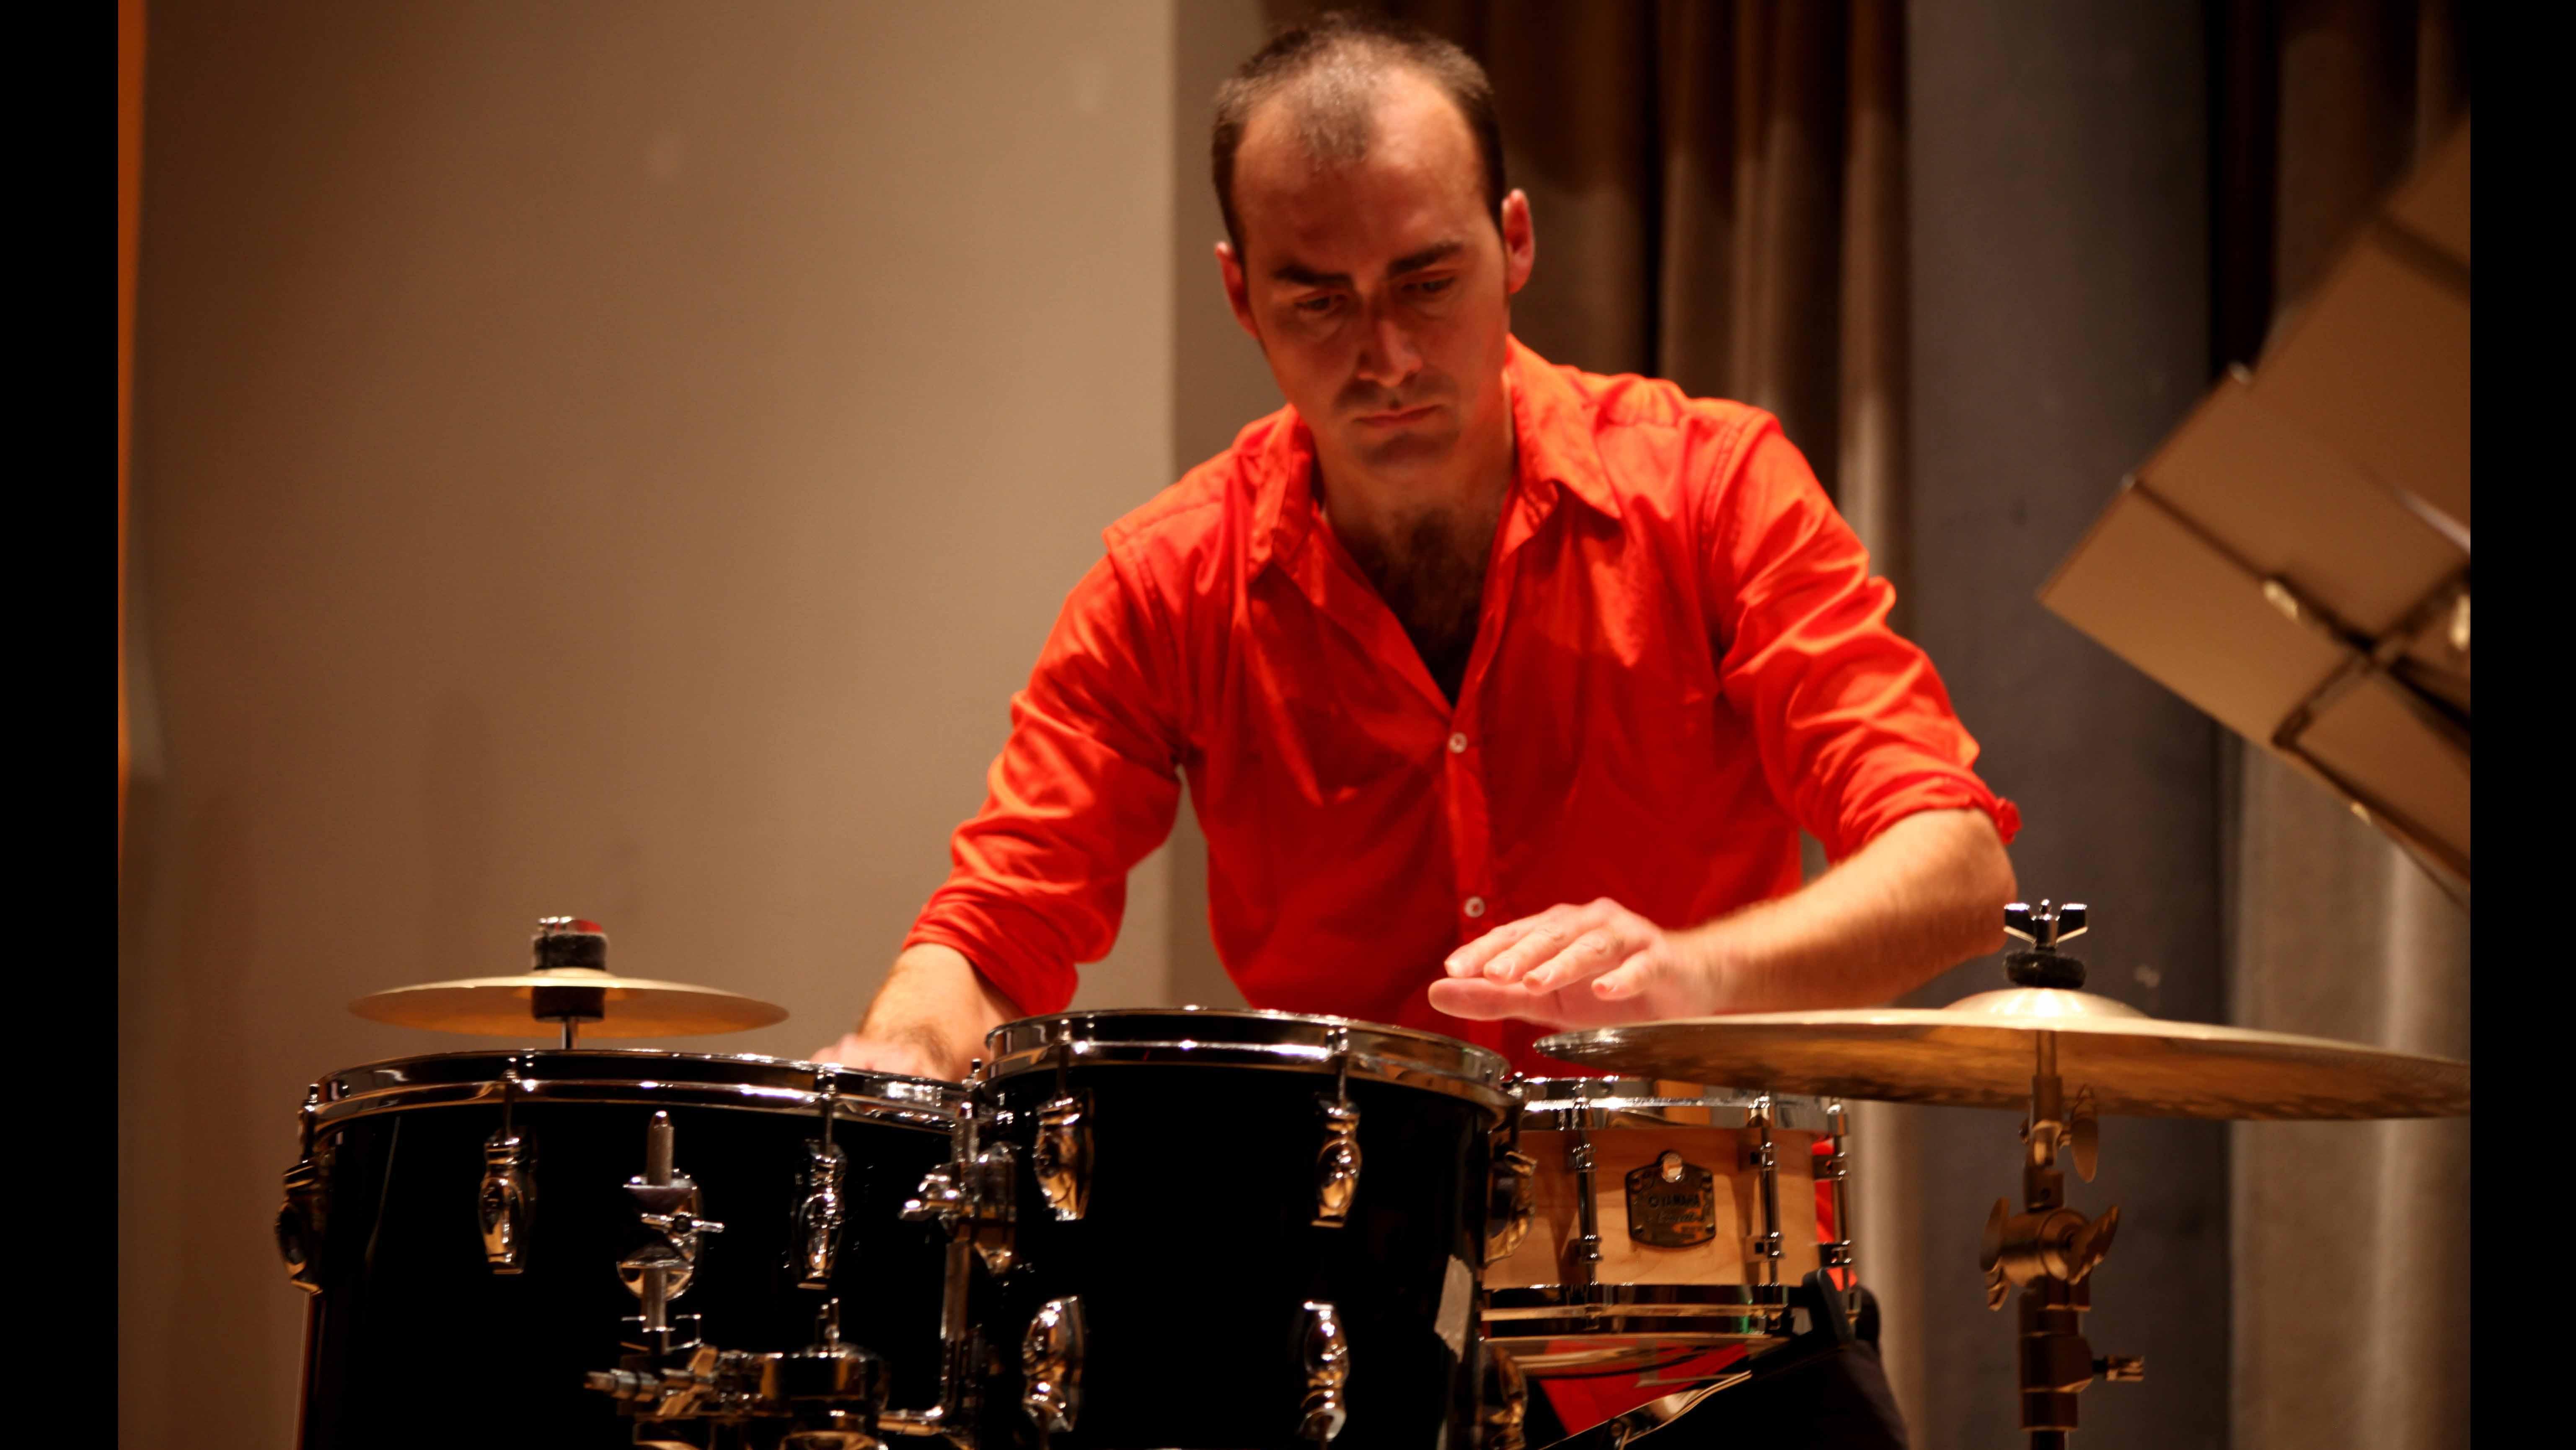 El percusionista utrerano Antonio Moreno